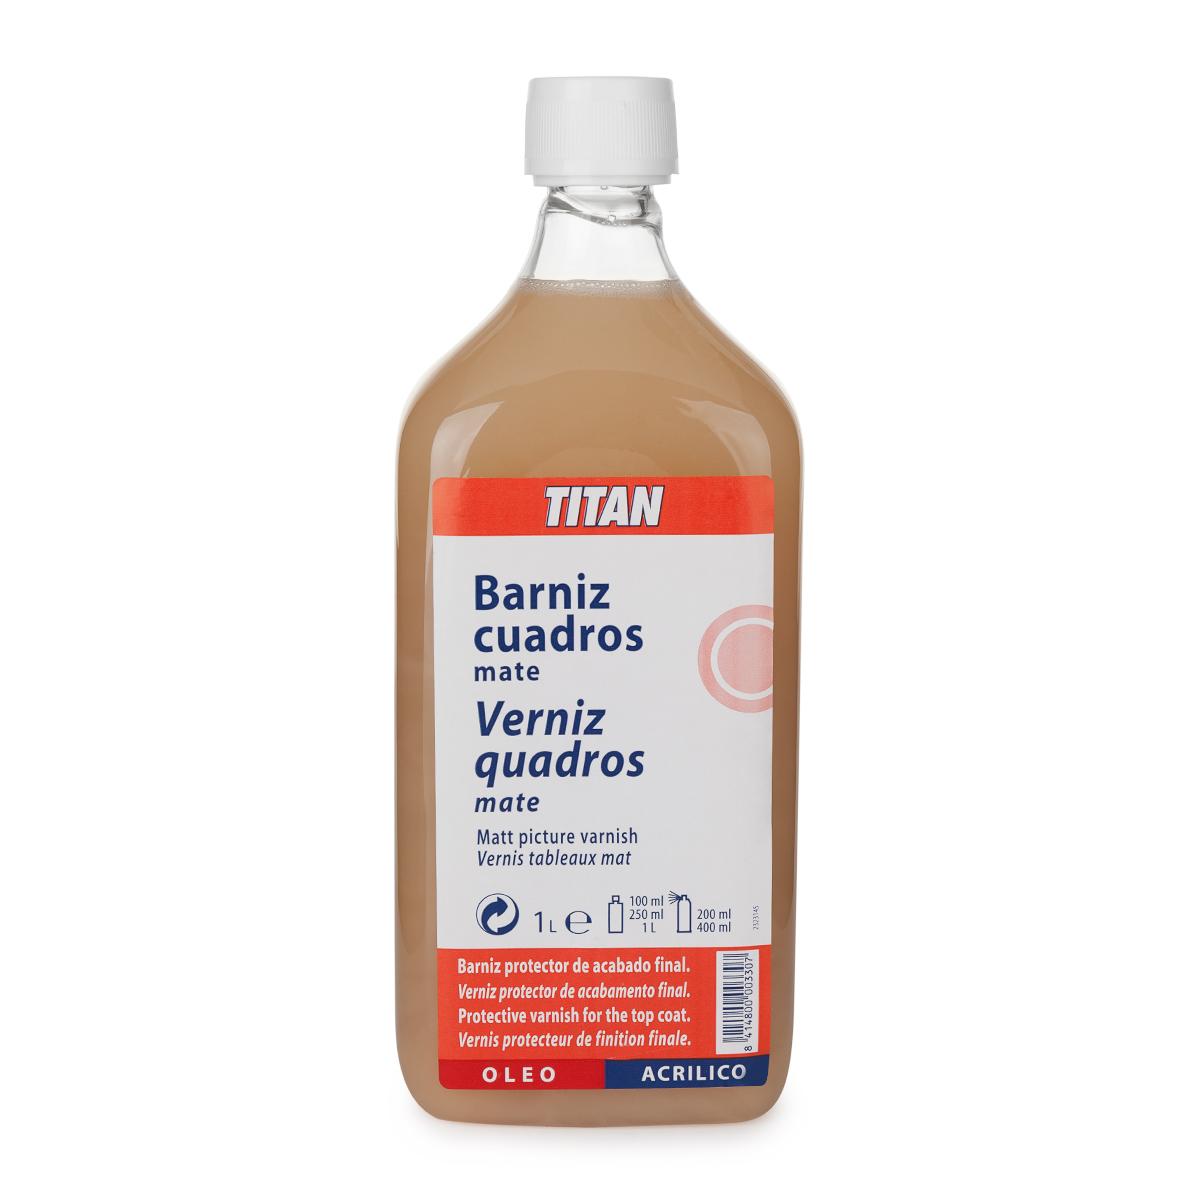 BARNIZ CUADROS MATE TITAN 1L